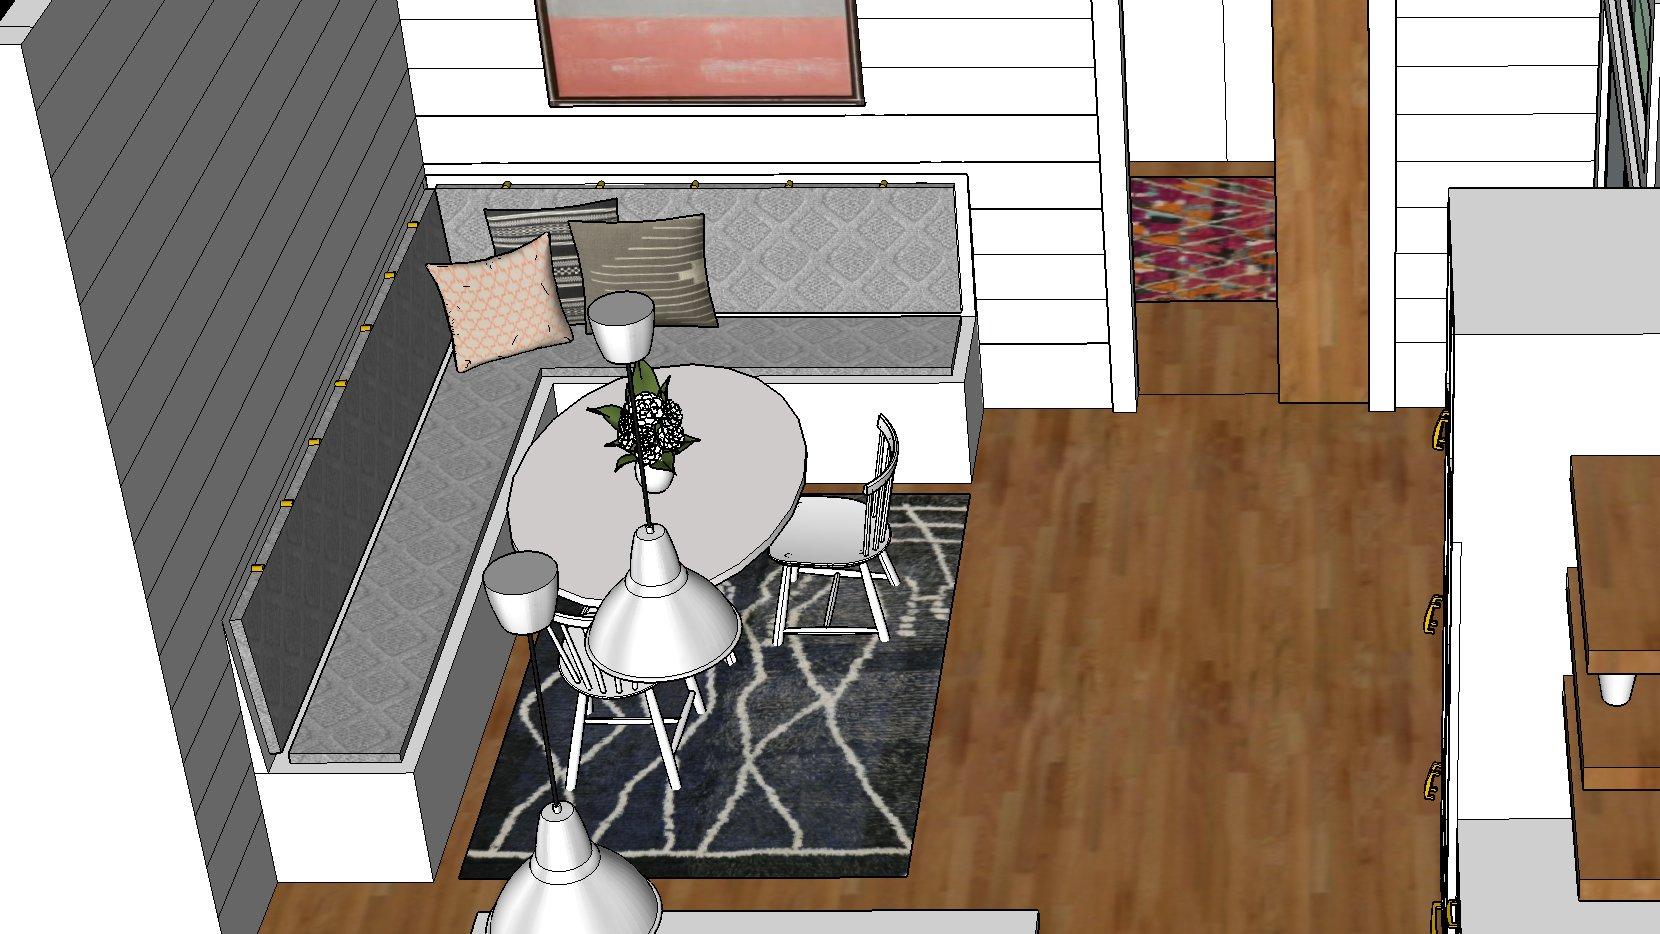 Love_Ding_Blog_Home_Renovateding_Renovation_Project_Breakfast_Nook_Interior_Design_Mock_Up.jpg